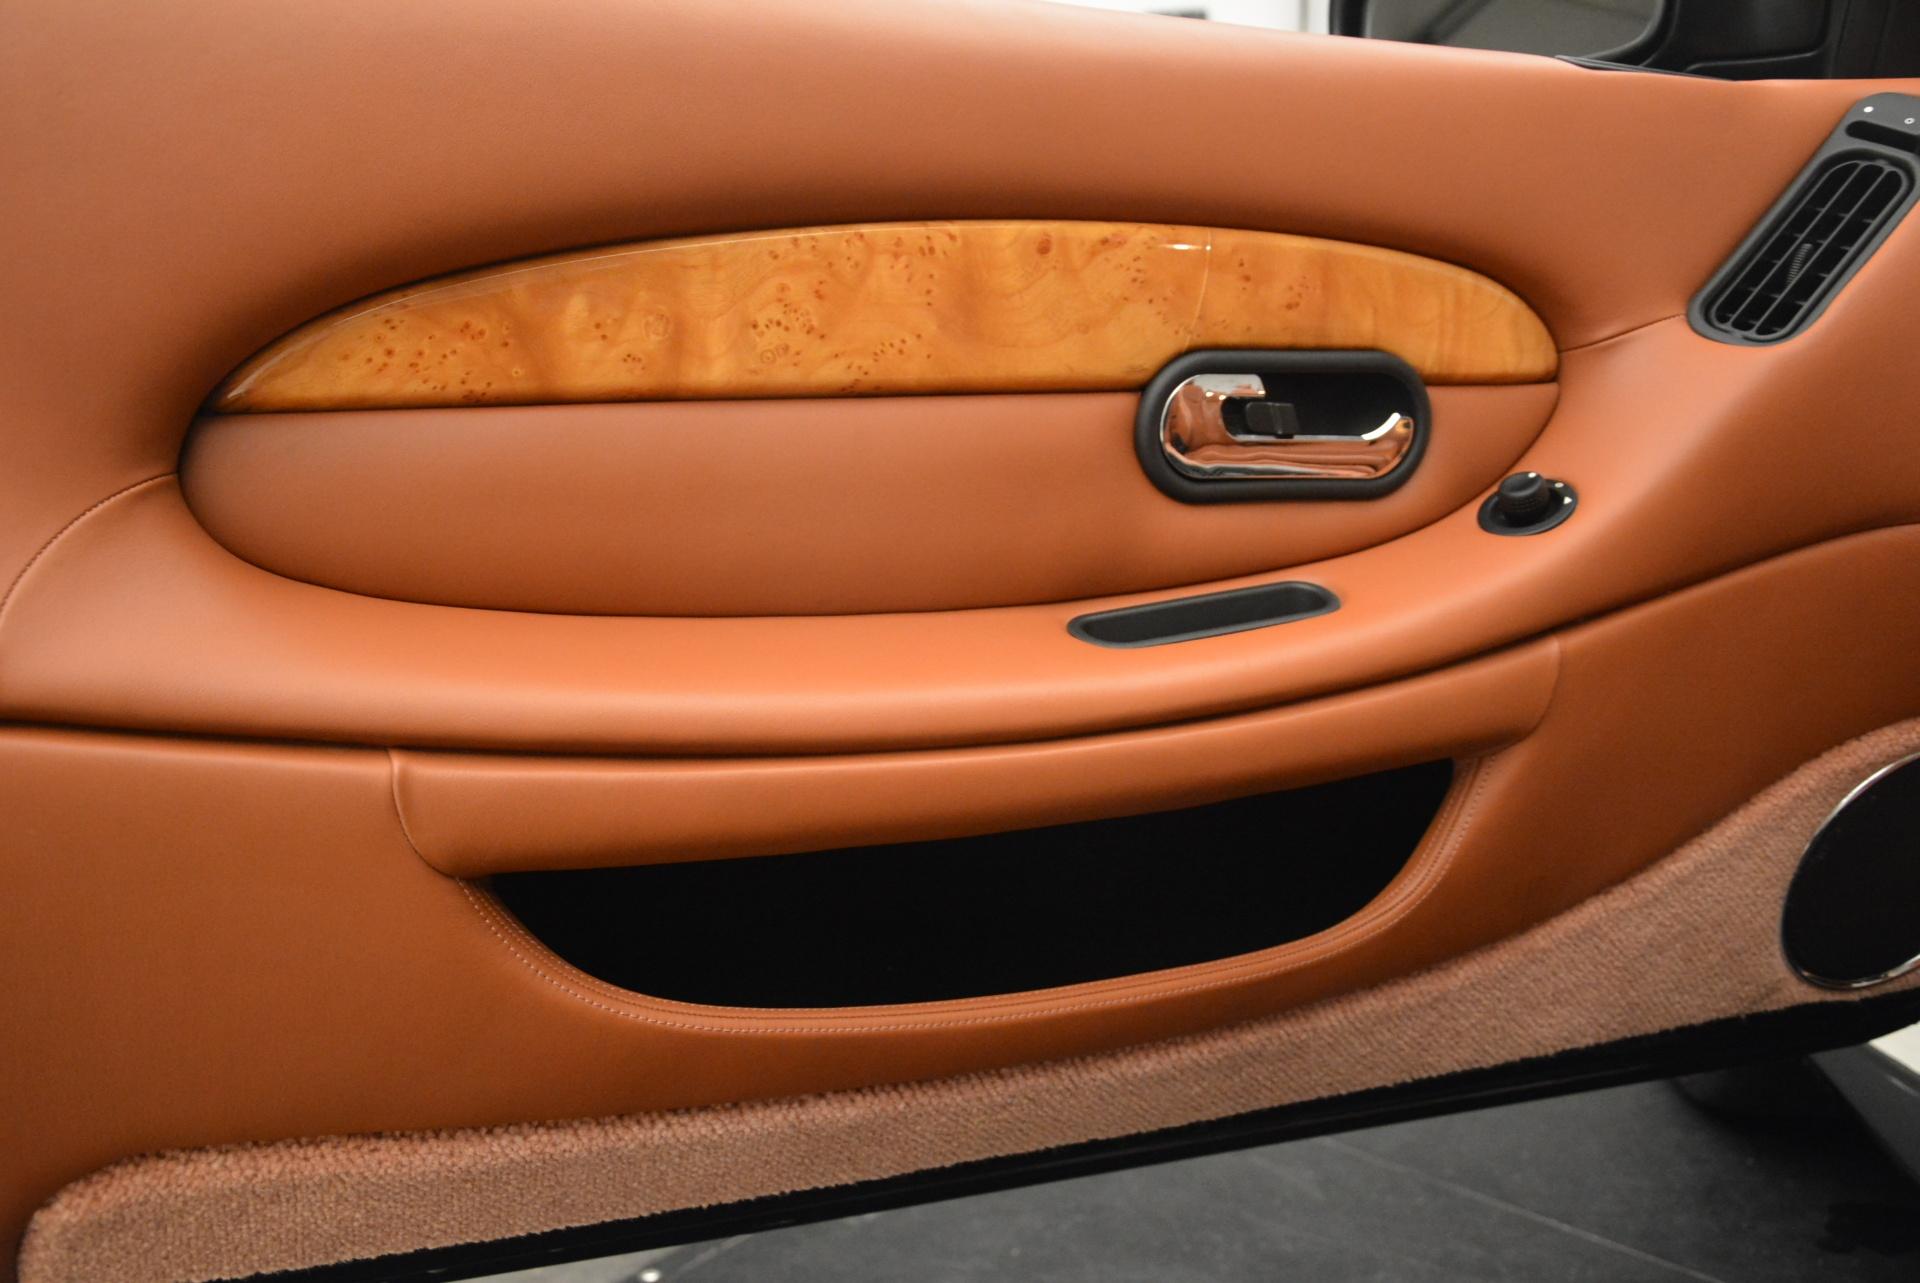 Used 2003 Aston Martin DB7 Vantage Volante For Sale In Westport, CT 2084_p25